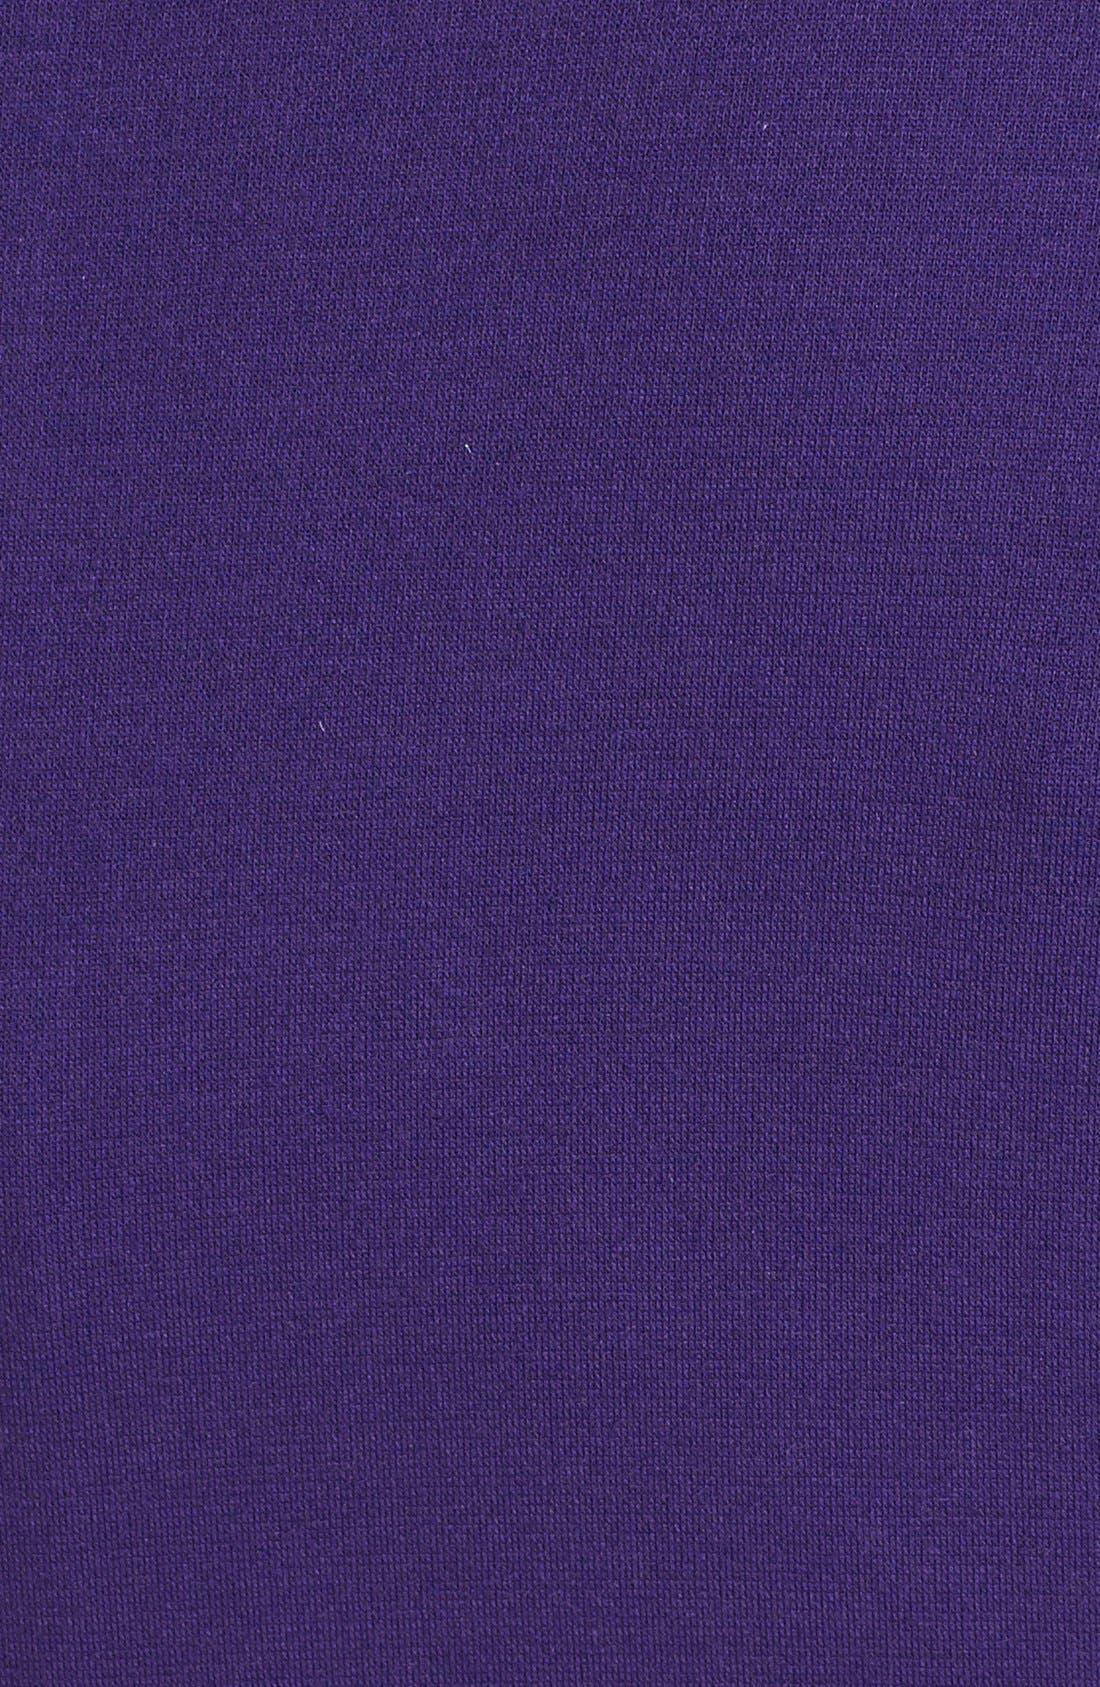 Alternate Image 3  - Ellen Tracy Seamed Ponte Knit Sheath Dress